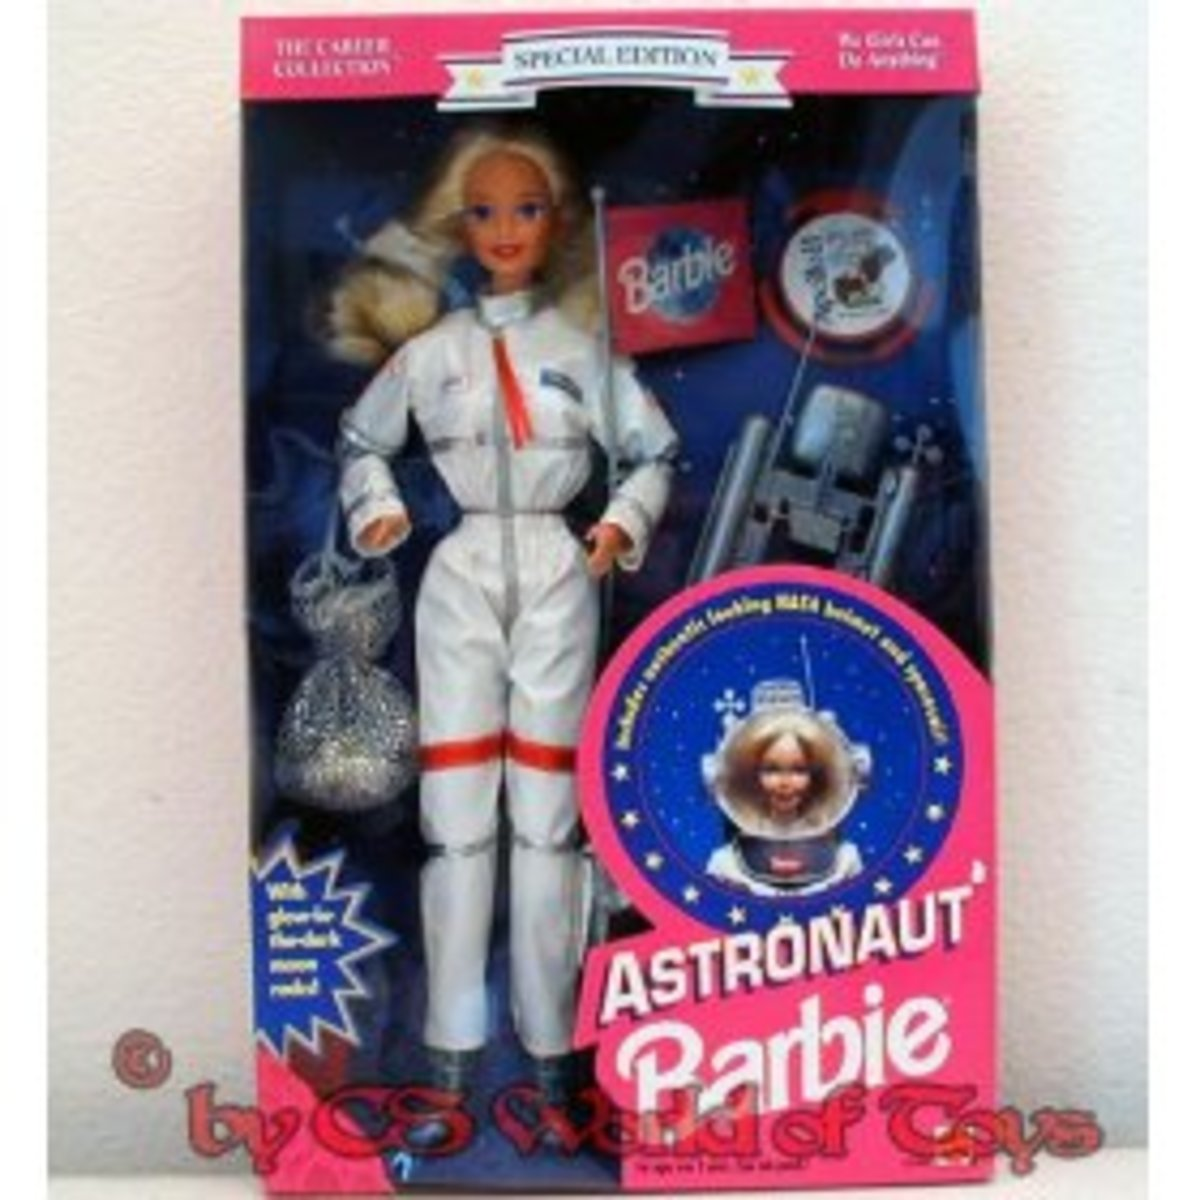 Astronaut Barbie from Amazon.com